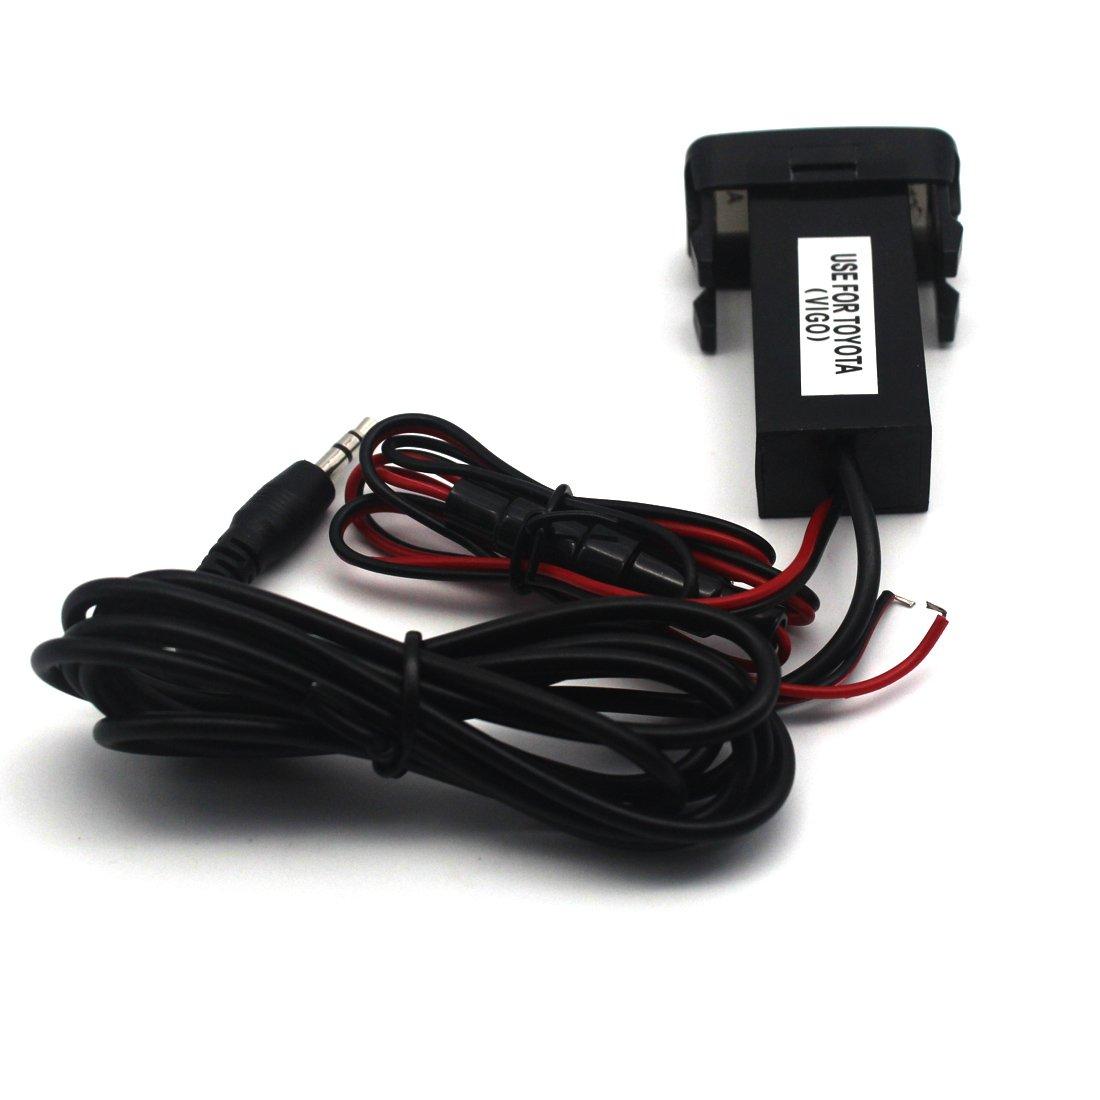 Toyota VIGO Car USB Socket Port with 3.5mm AUX Socket 40 20mm Samsung,LG,Huawei and More MOTONG Car USB Power Socket Port For iPhone X//8//7//6//5 4327076743 iPad